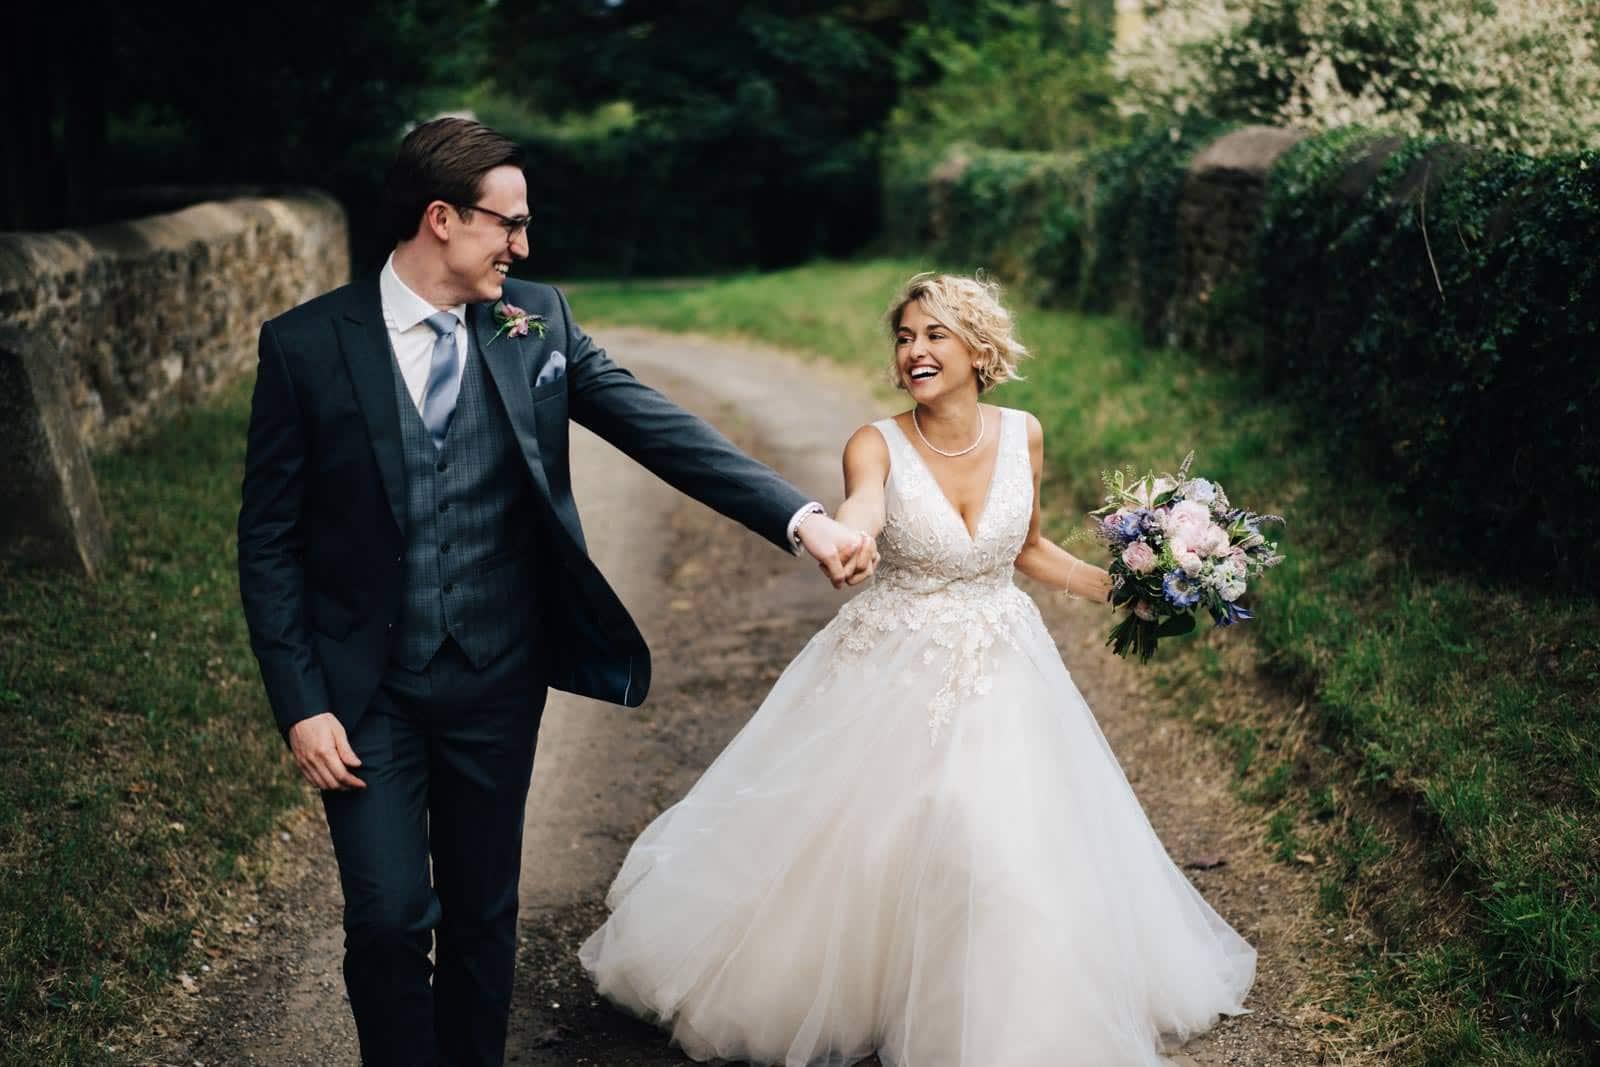 warwickshire wedding photographer, couple looking beautiful as they walk together